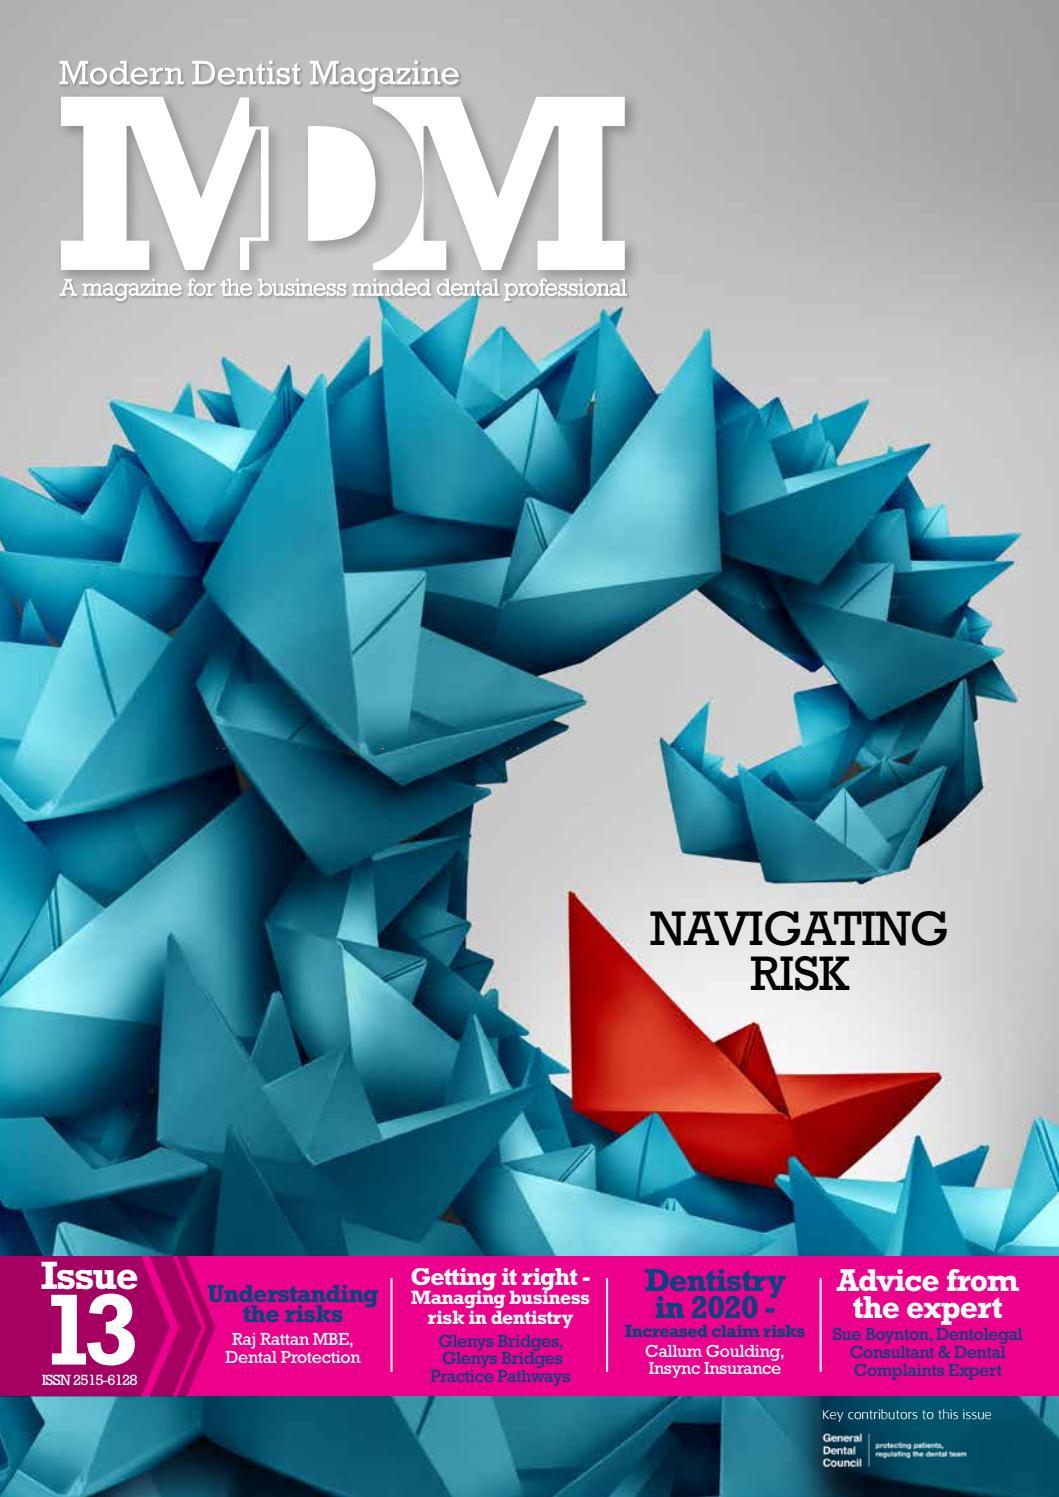 Modern Dentist Magazine Issue 13 By Charlton Grant Issuu